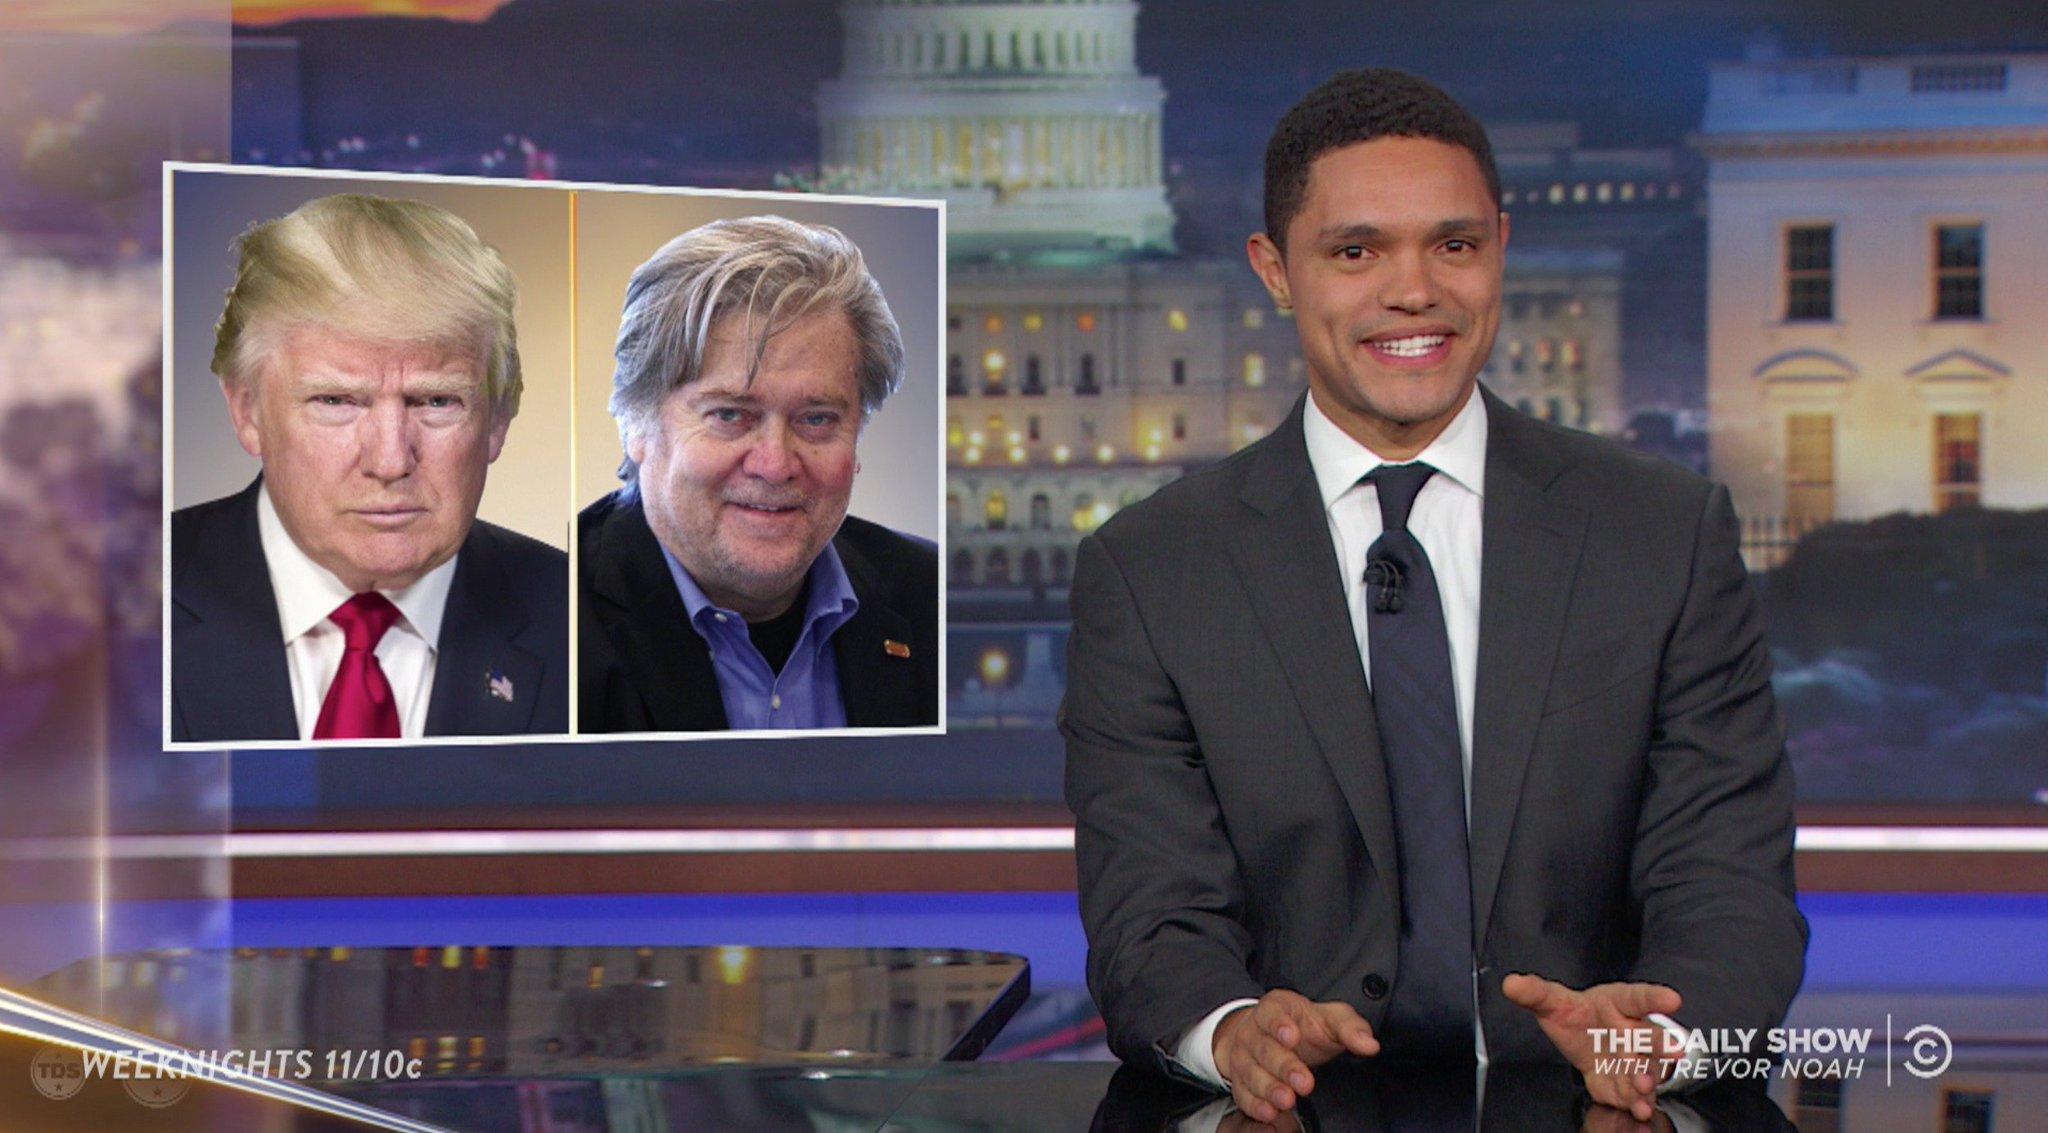 Tonight at 11/10c: Donald Trump vs. Steve Bannon beef is ������. Who you got? https://t.co/0iK5OZQ23j